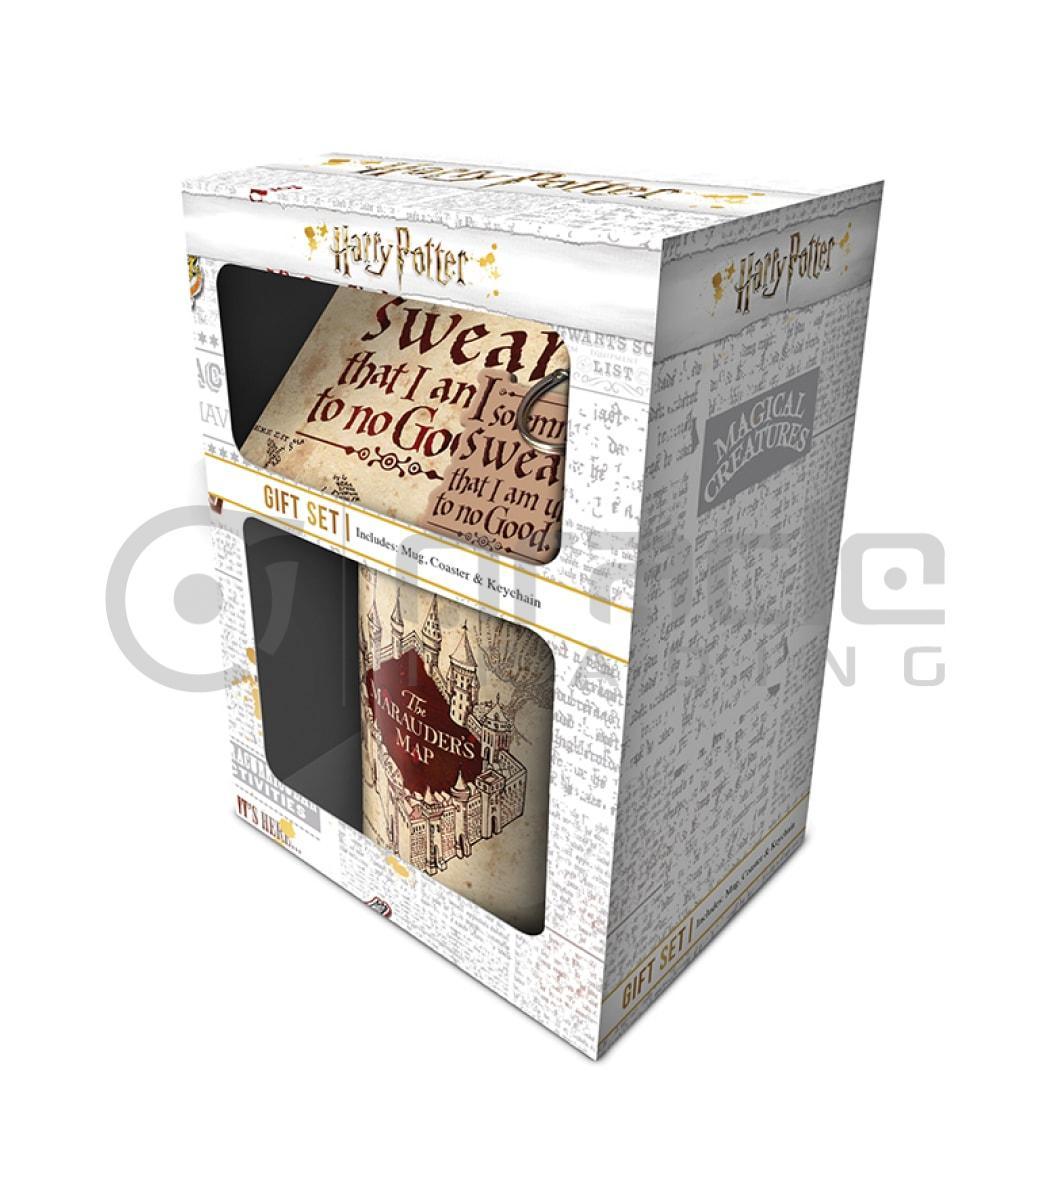 Harry Potter Gift Box - Marauders Map